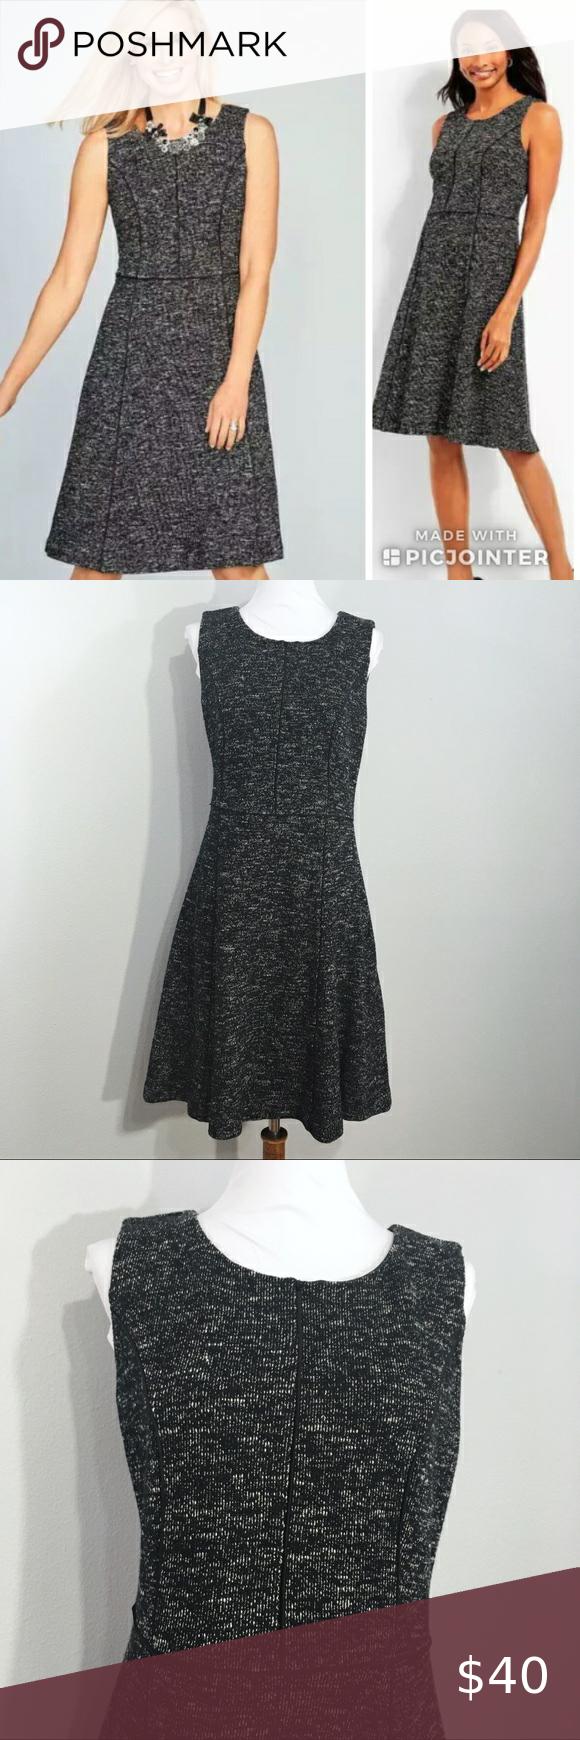 Talbots Black Berkeley Tweed Fit Flare Dress 6p Fit Flare Dress Flare Dress Talbots Dress [ 1740 x 580 Pixel ]